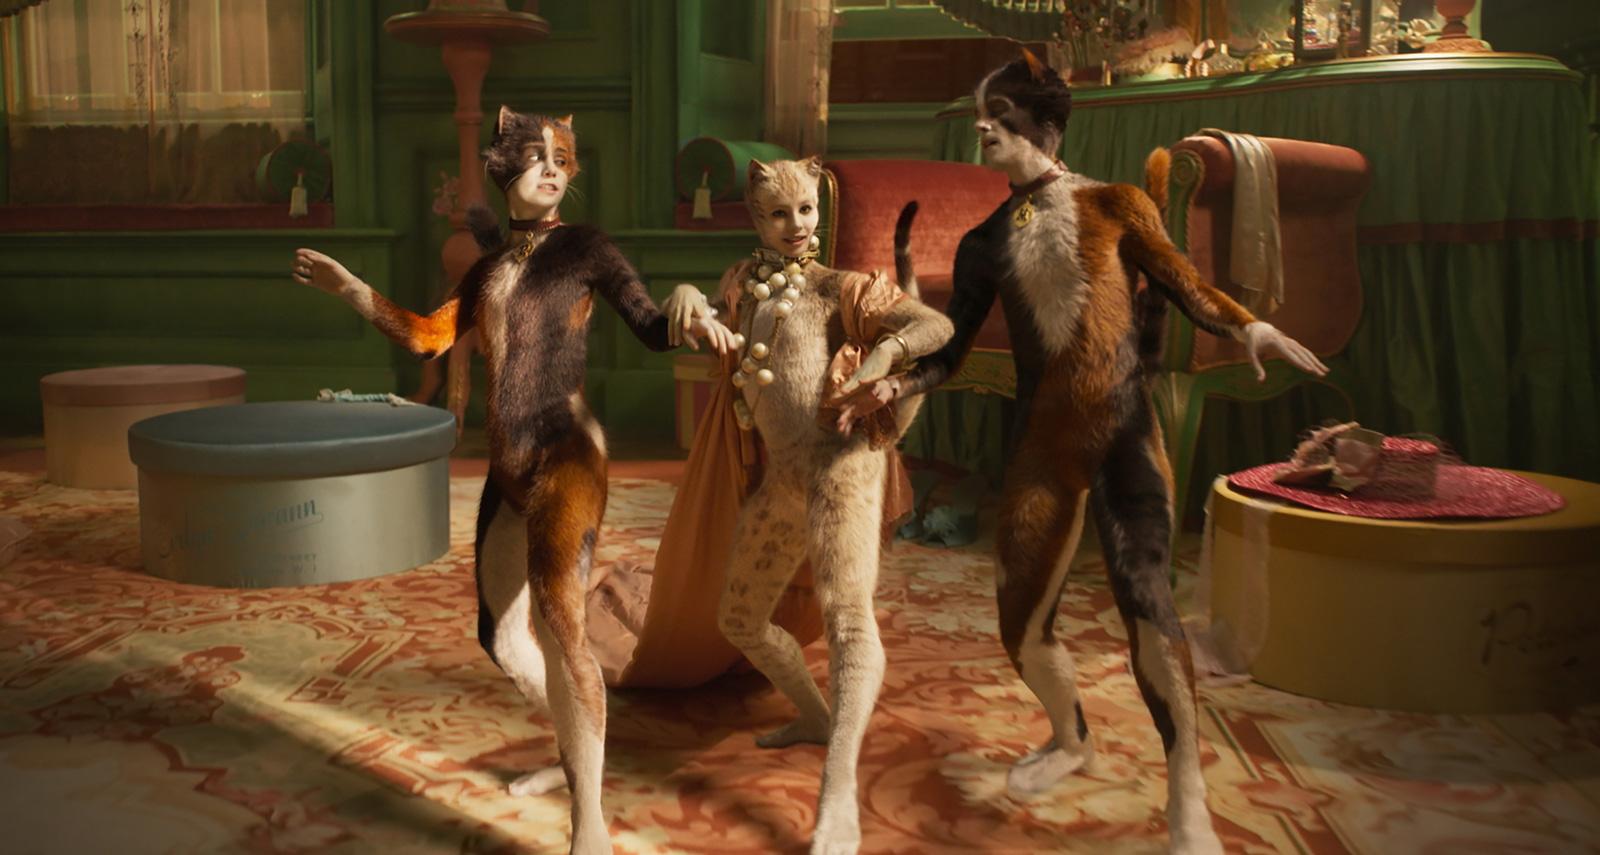 Naoimh Morgan as Rumpleteazer, Francesca Hayward as Victoria, and Danny Collins as Mungojerrie in Tom Hooper's Cats, 2019